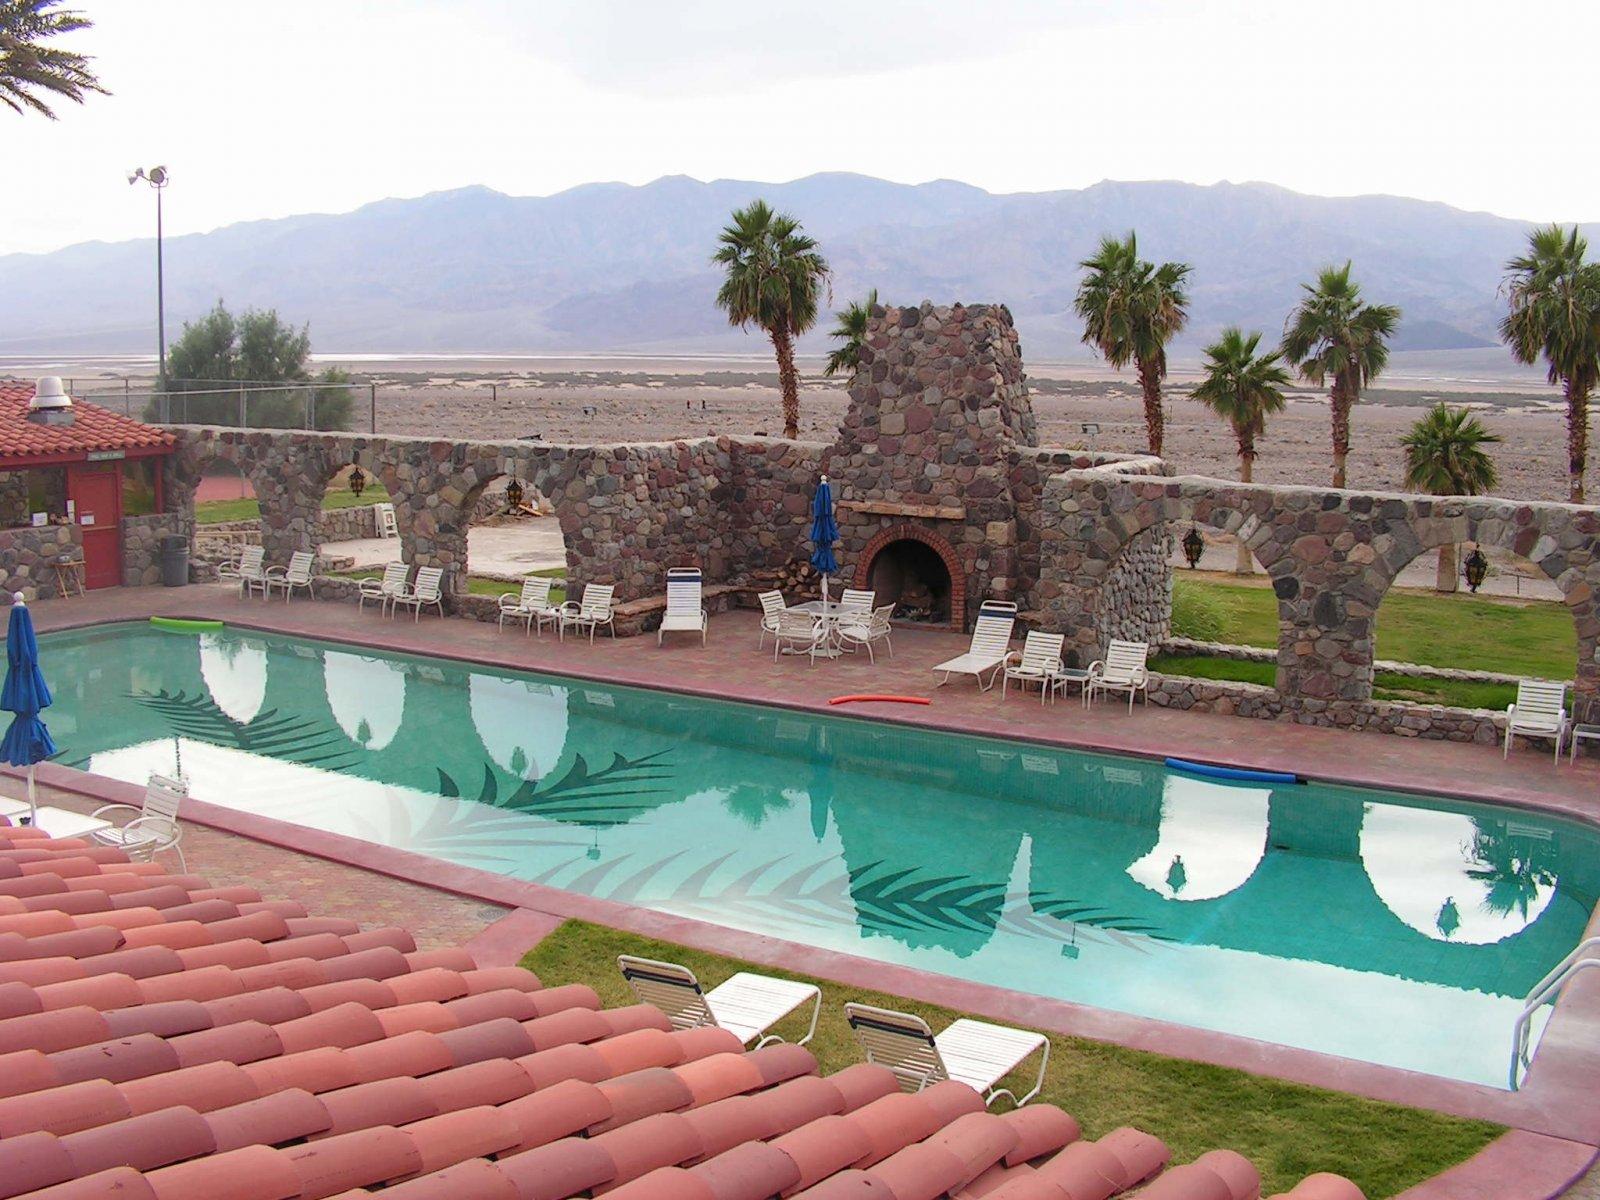 Click image for larger version  Name:Pool at Furnace Creek Inn.jpg Views:55 Size:318.7 KB ID:115966